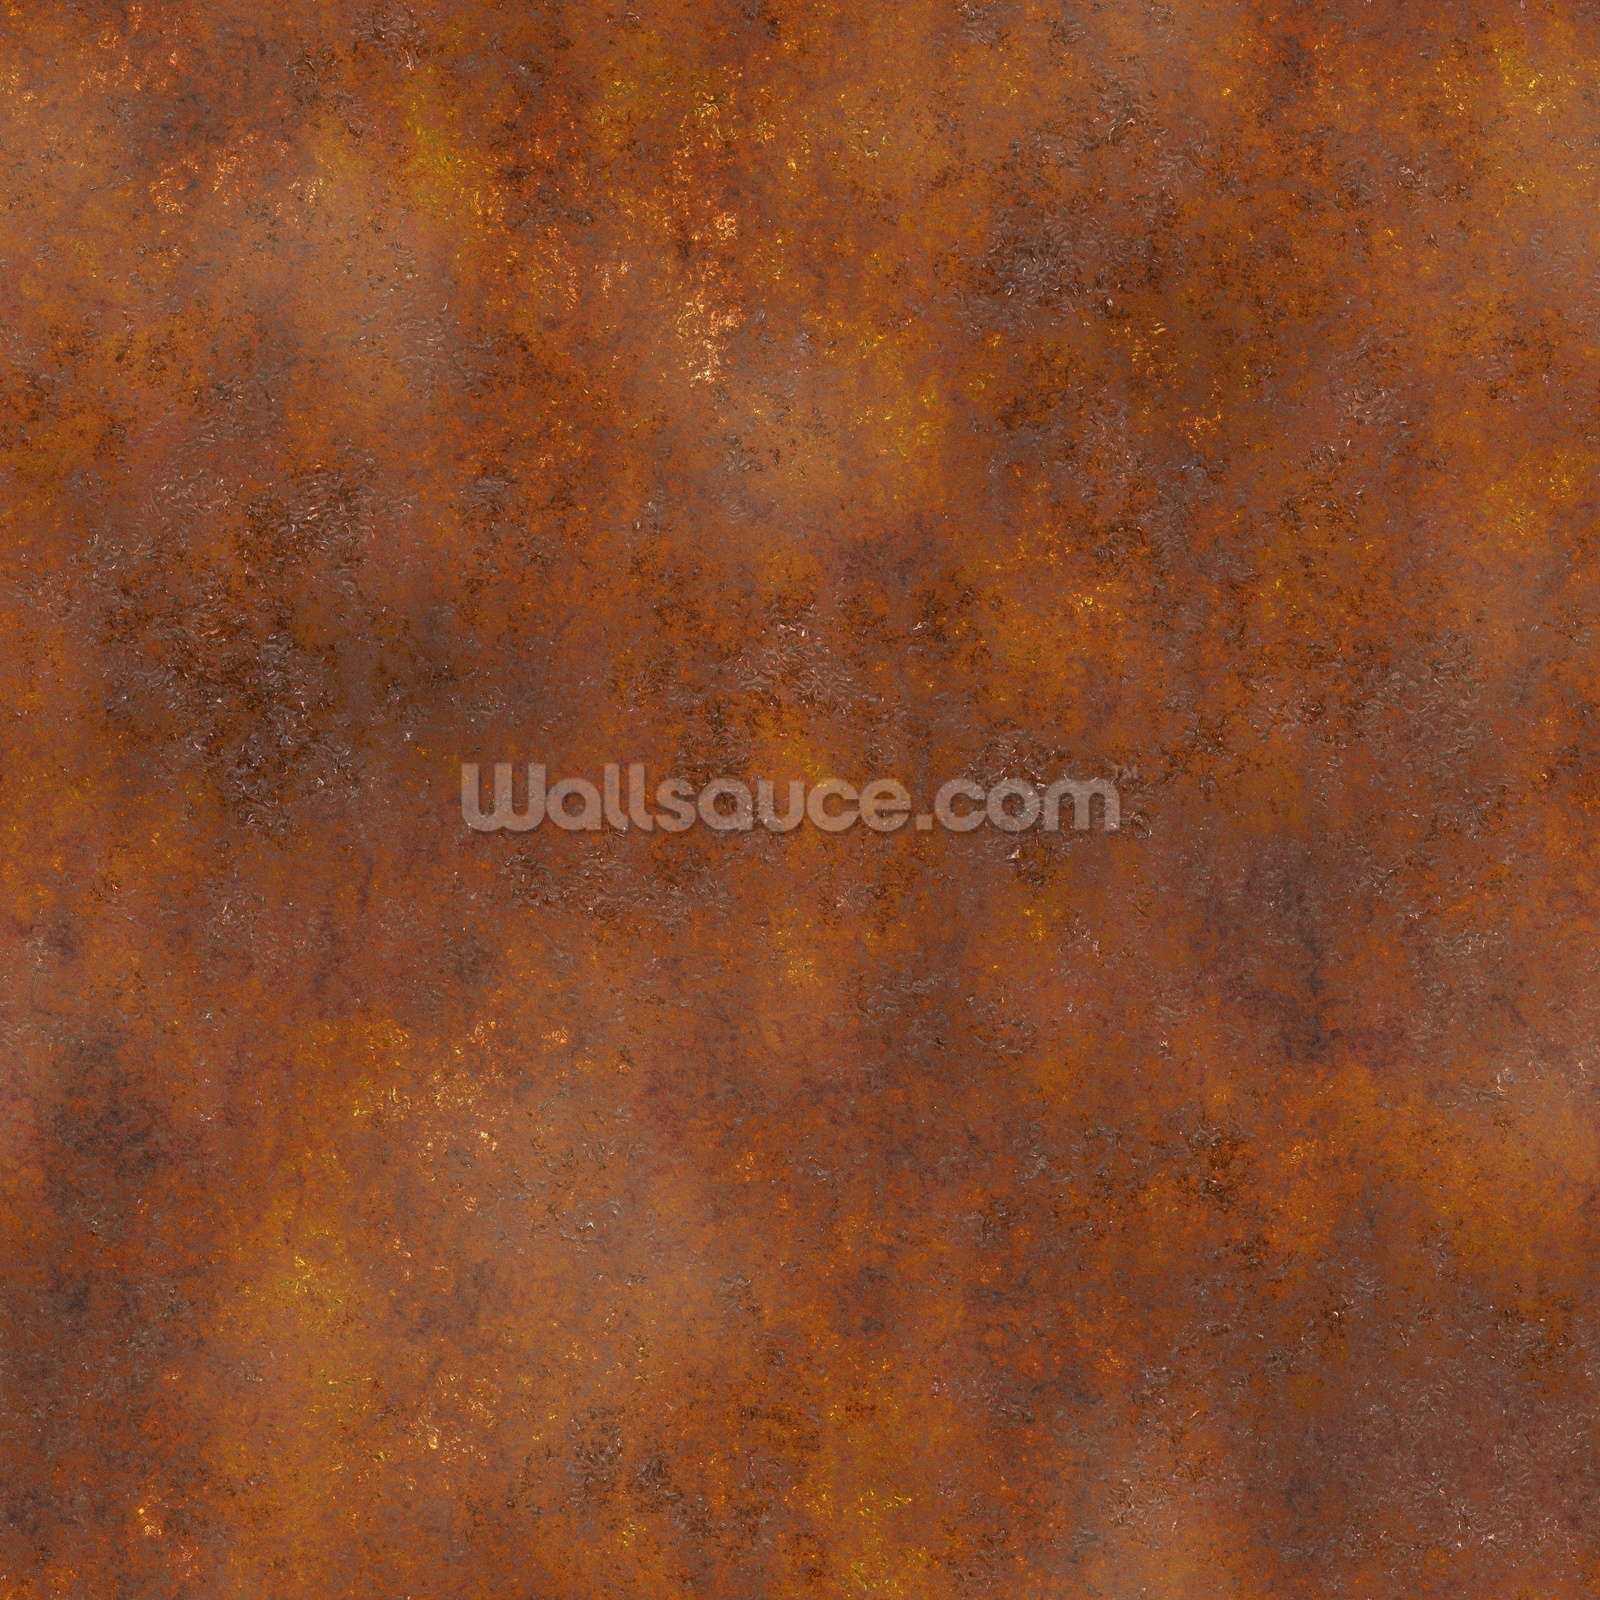 Rust Effect Mural Wallpaper